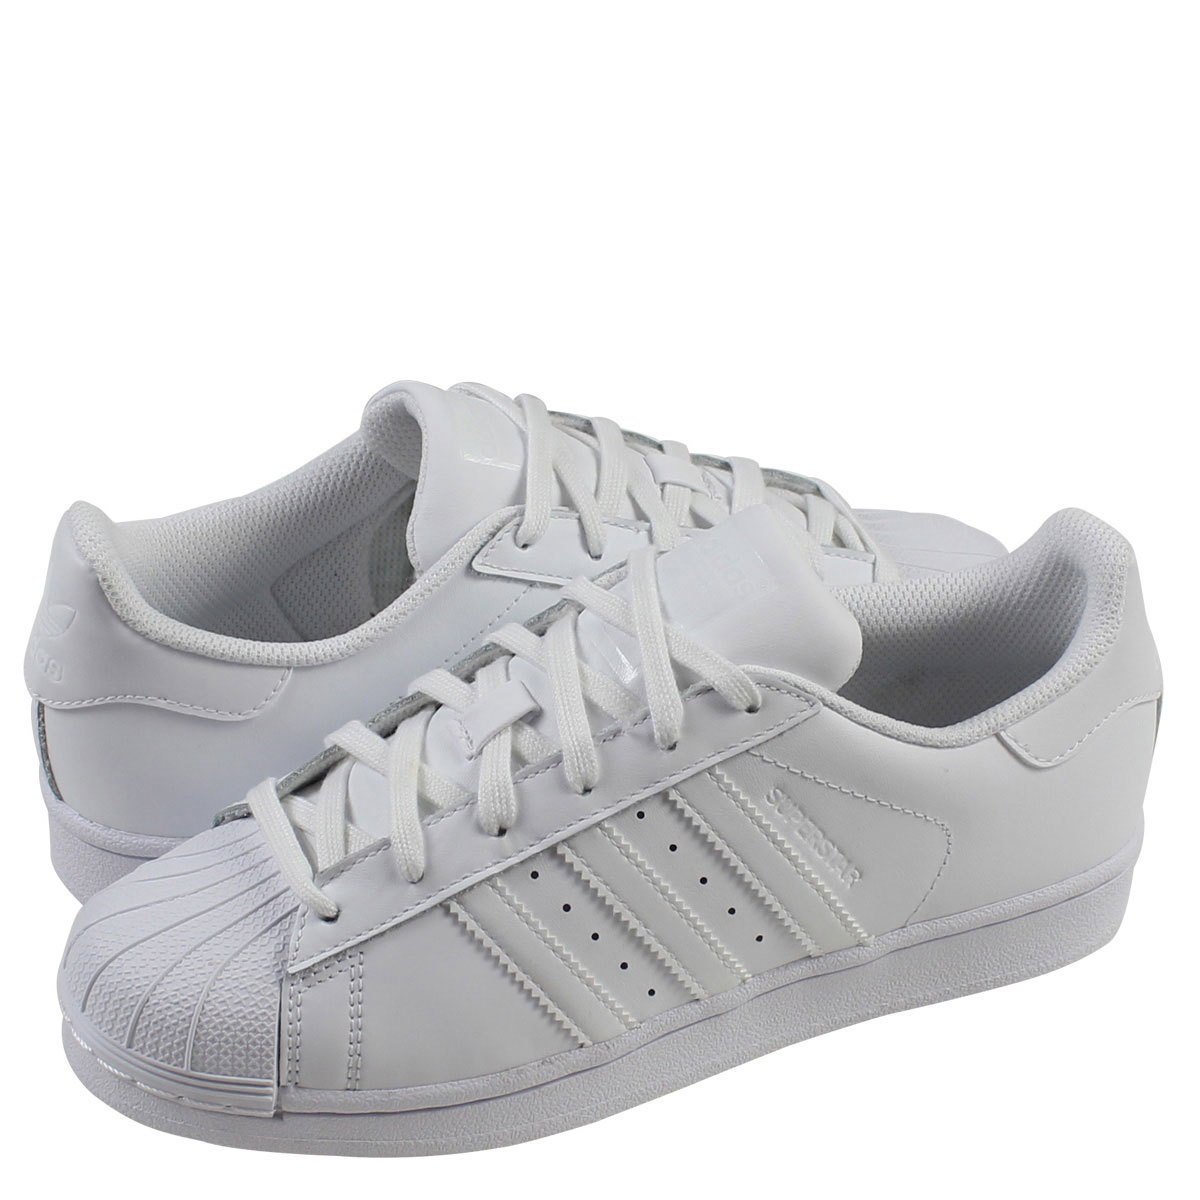 712926b53cf7 ... top quality allsports laquopre order itemsraquo laquo7 31 days  stockraquo adidas originals adidas originals womens superstar